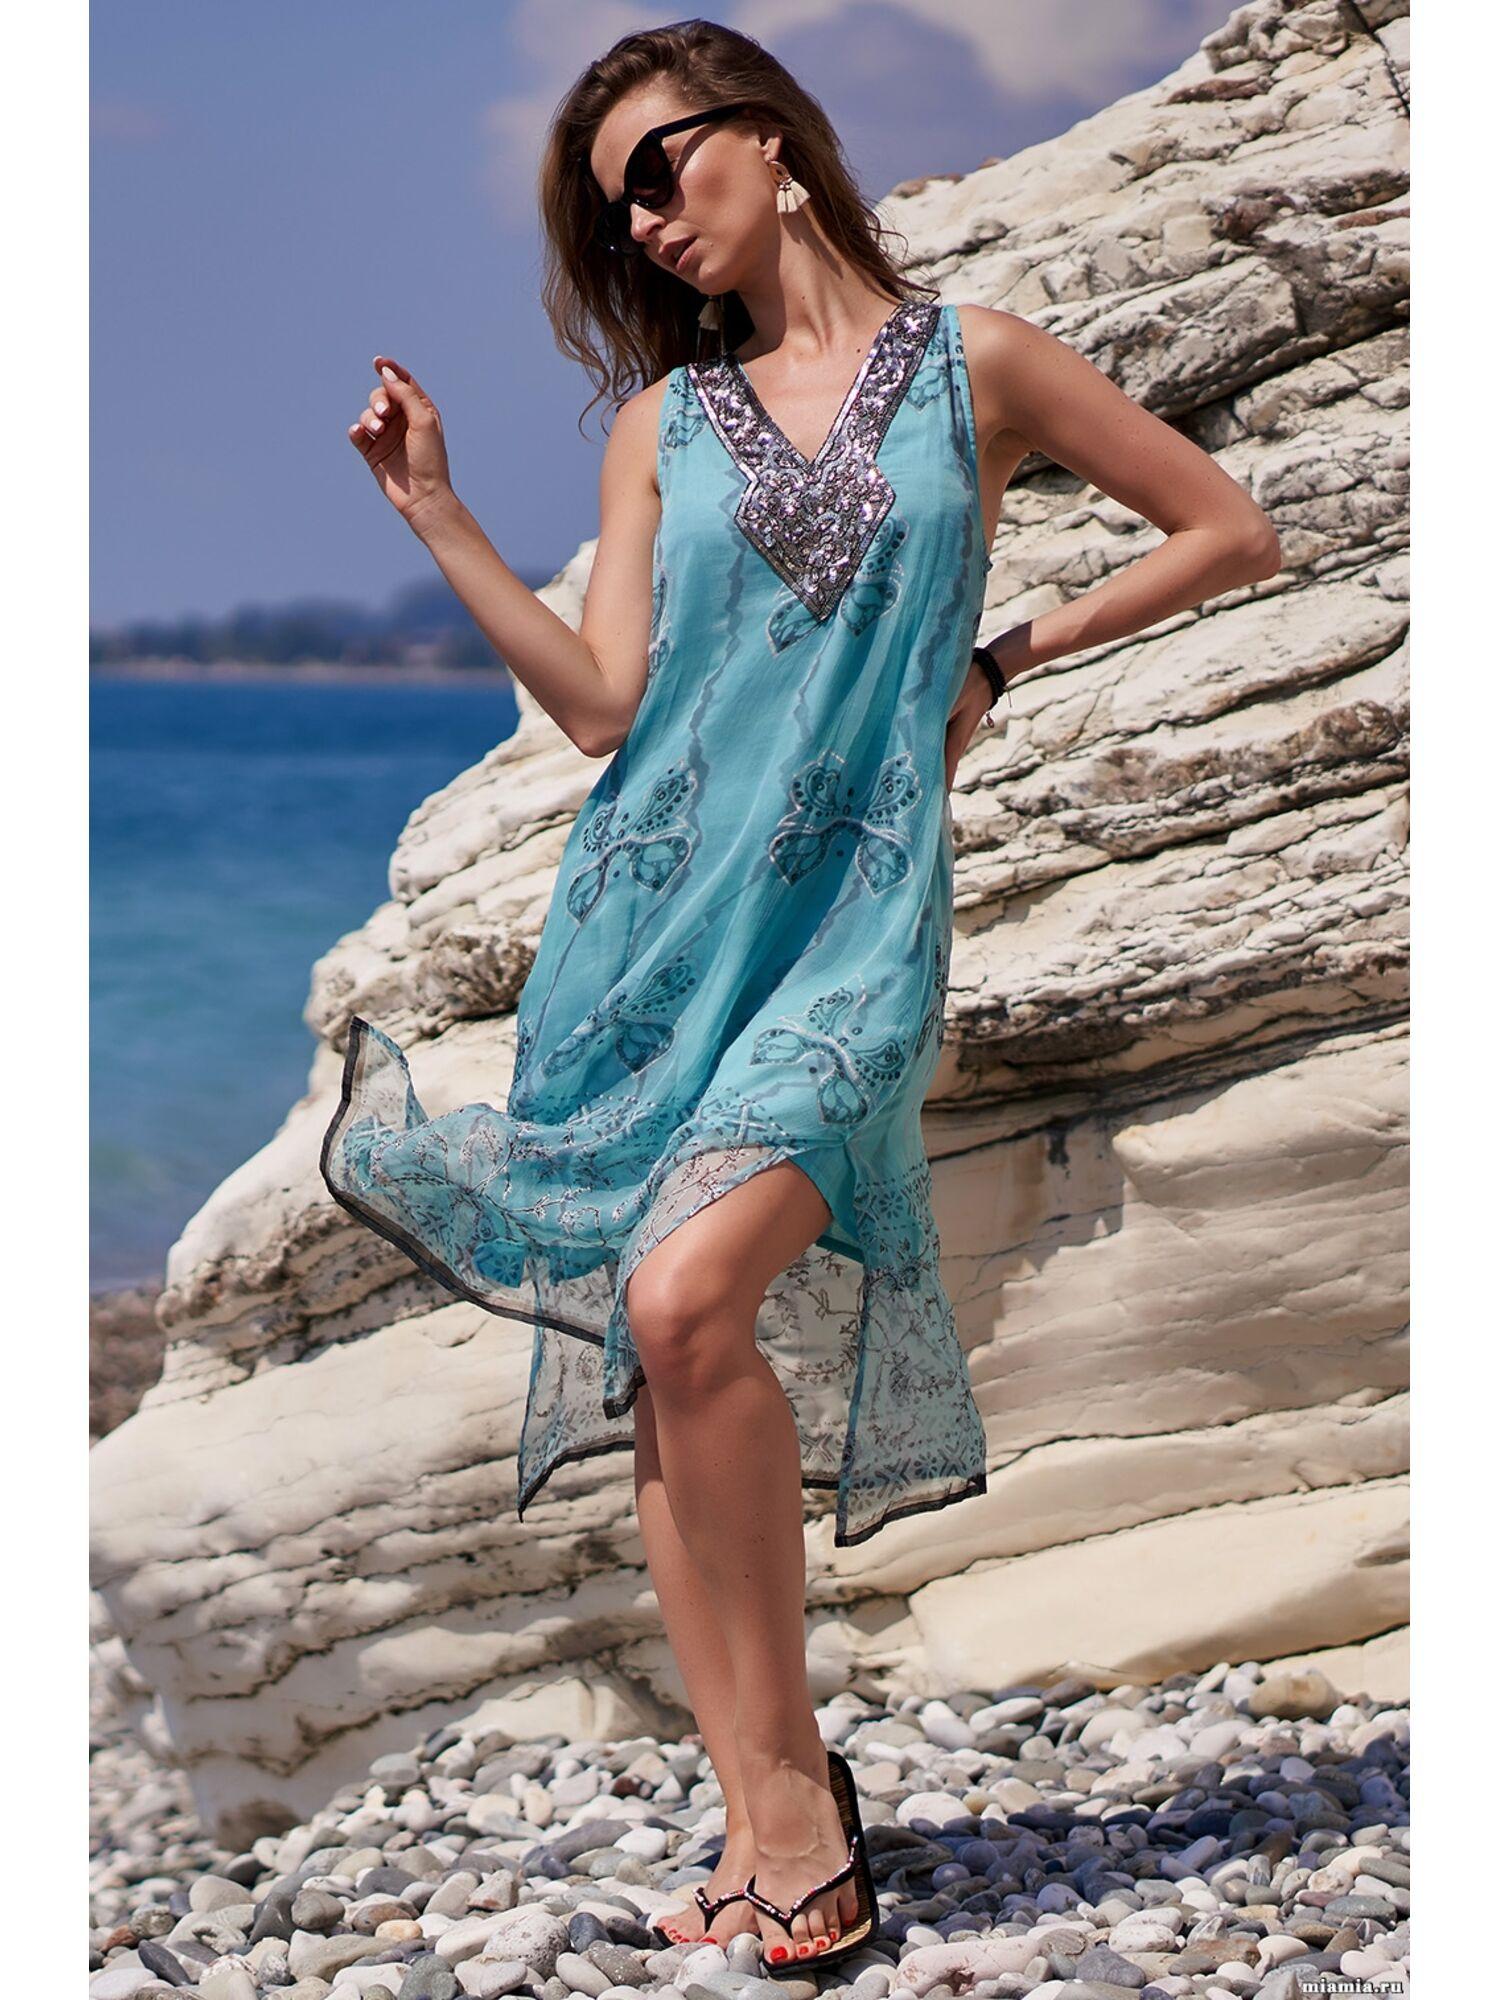 Сарафан, туника пляжная хлопковая Доминикана 1410, синий, Mia-Amore